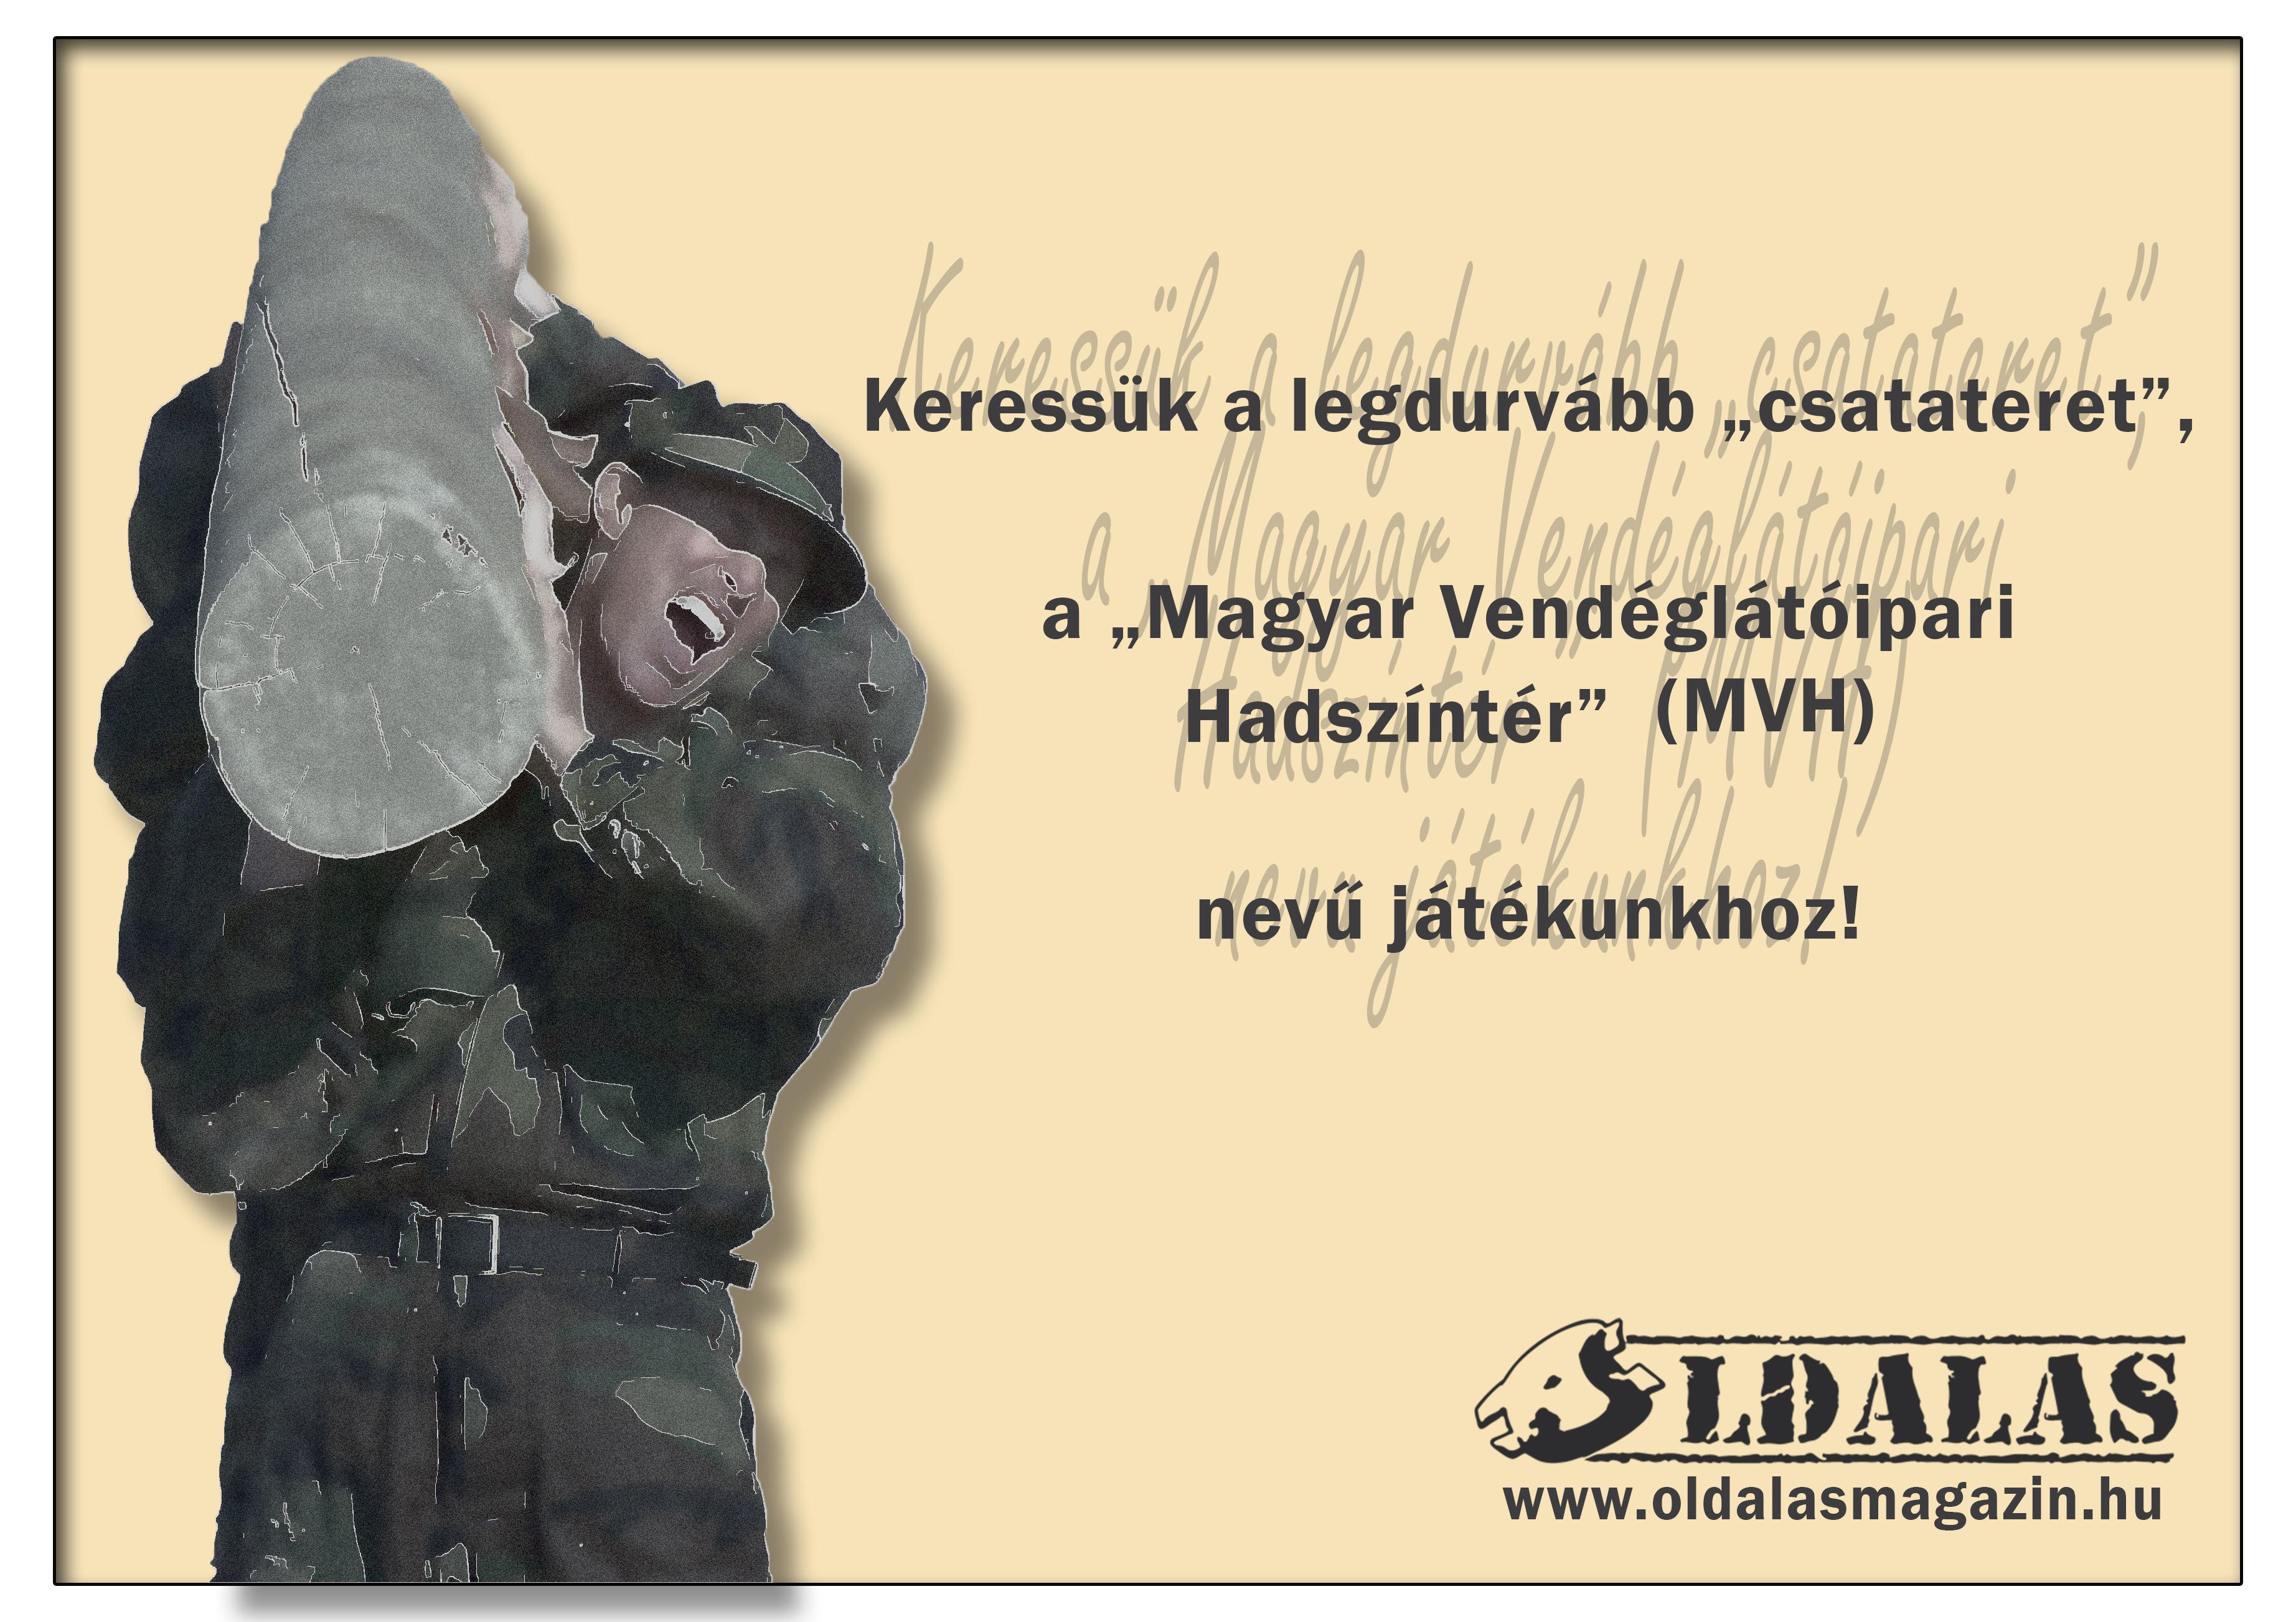 mvh_jatek_oldalas_magazin_magyar_vendeglatas